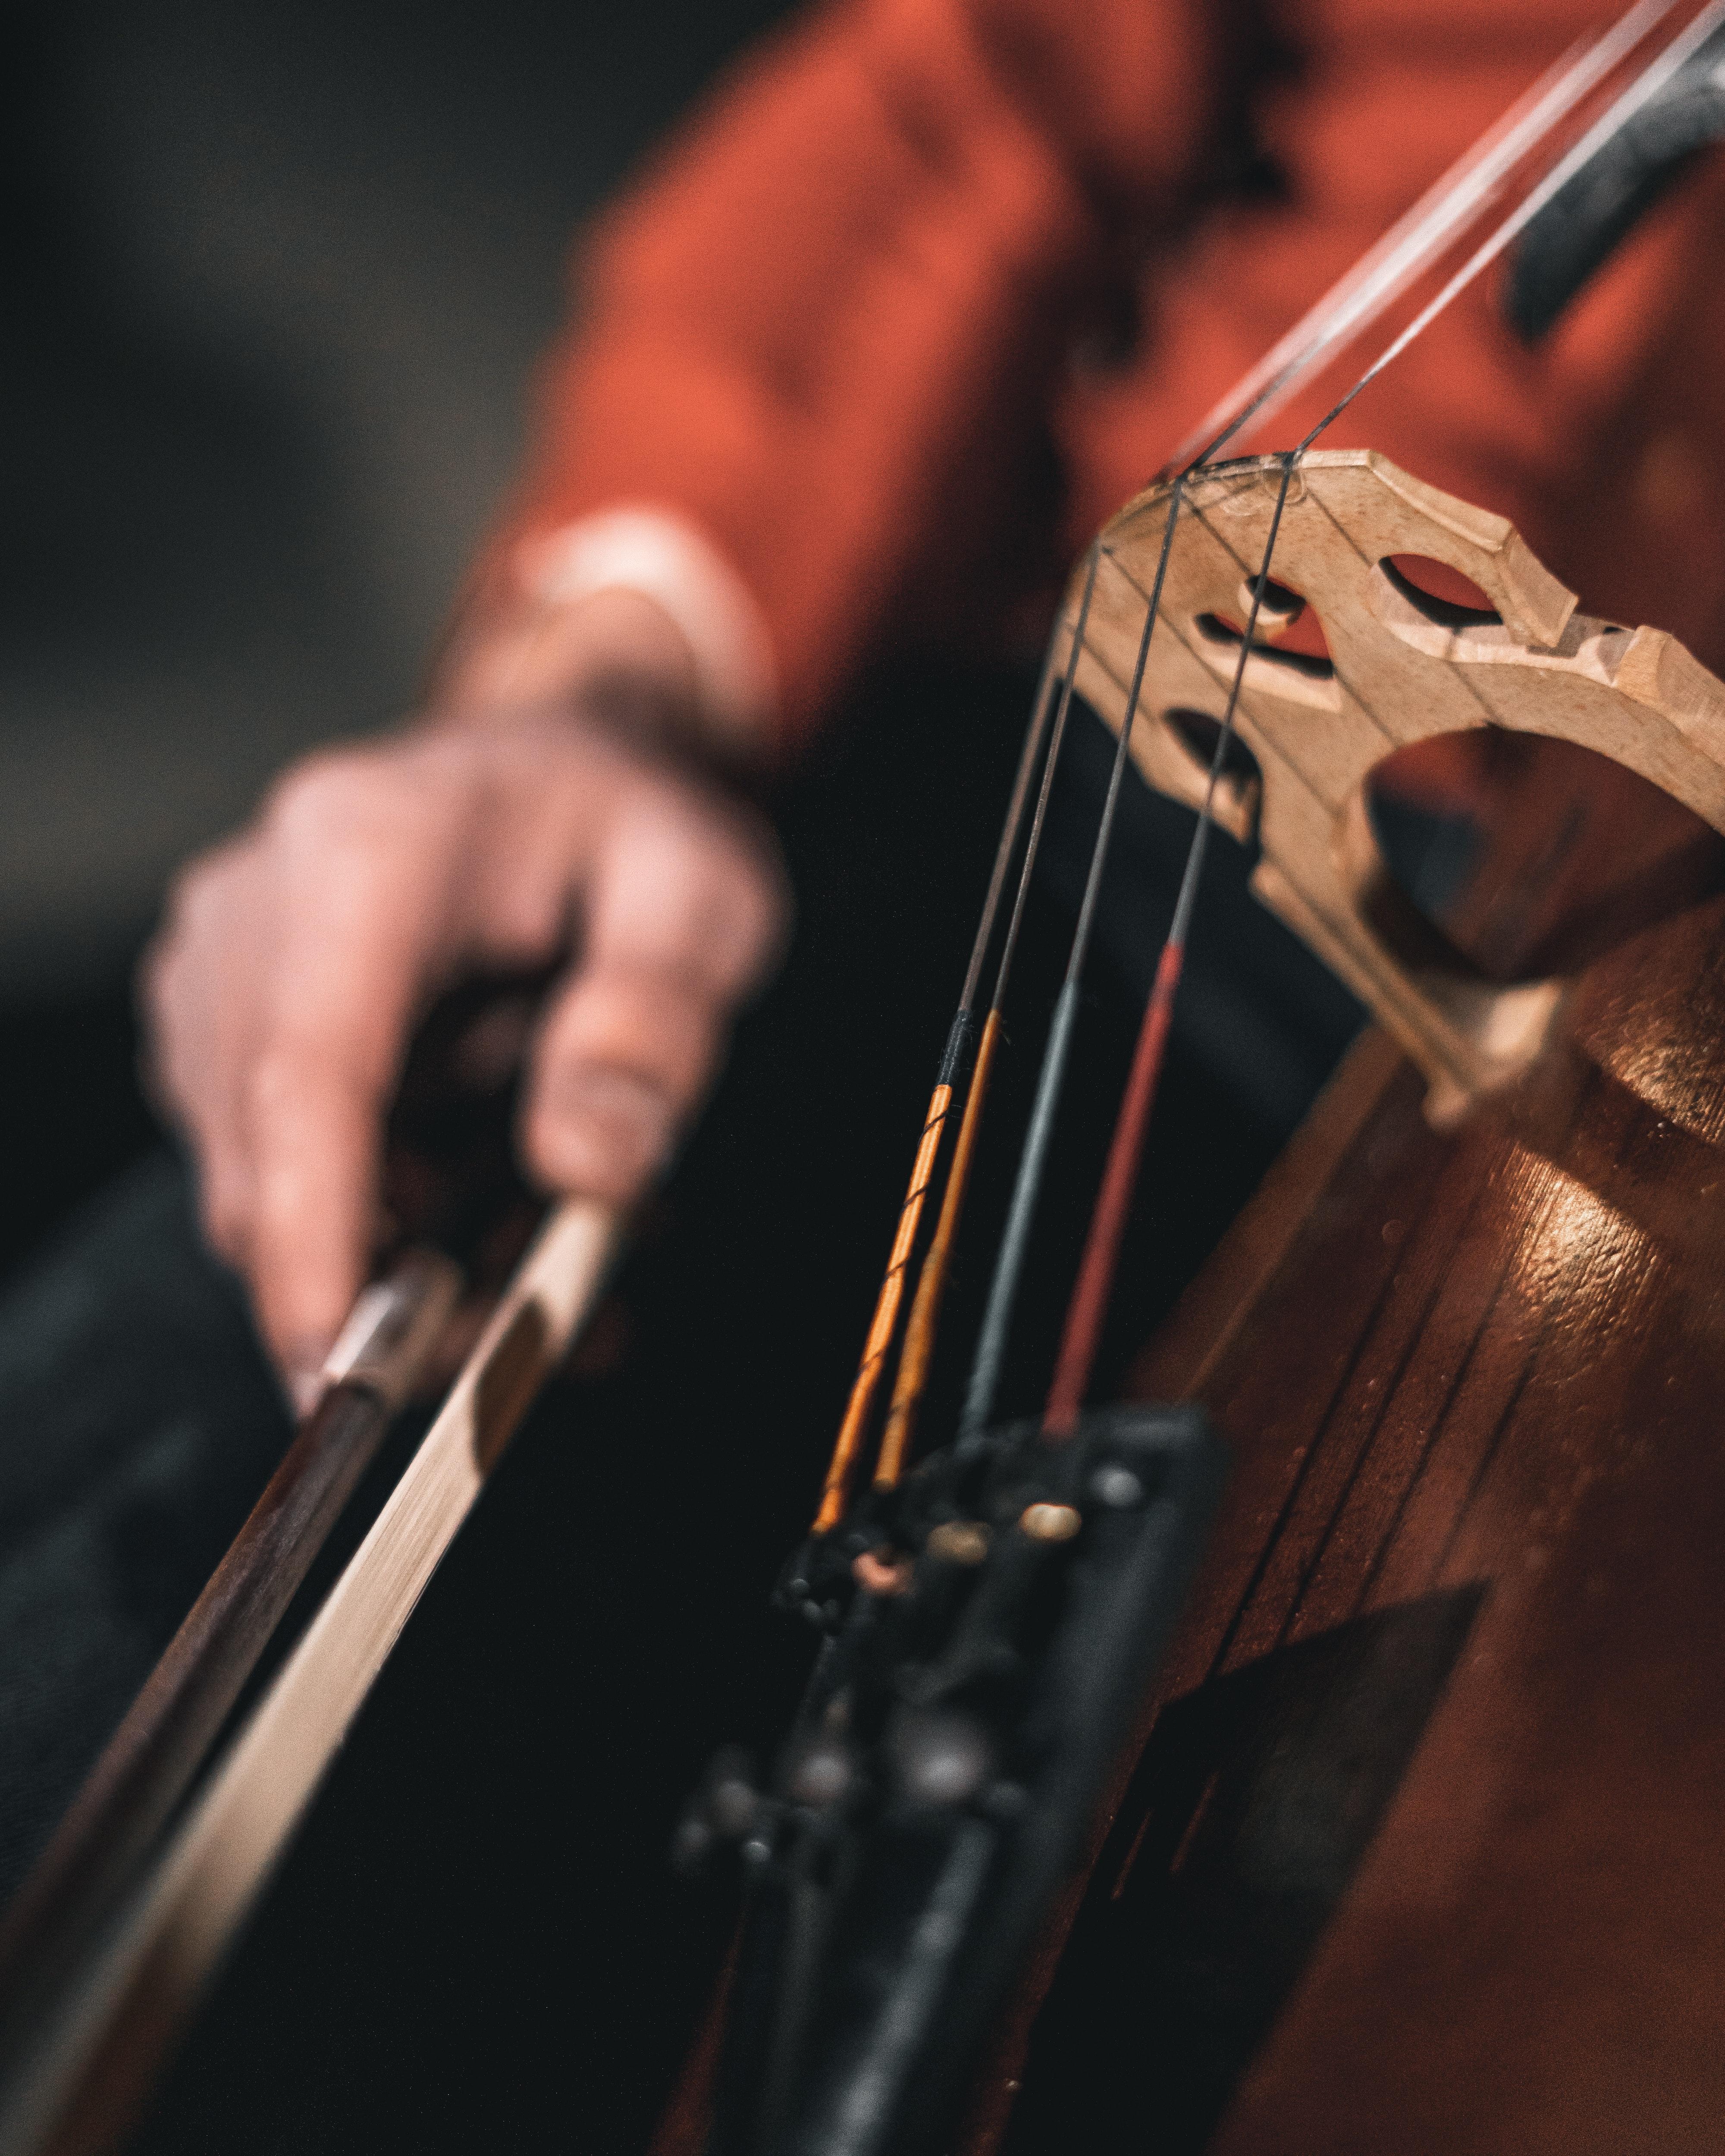 musica-concierto-pexels-quentin-ecrepont-2228466